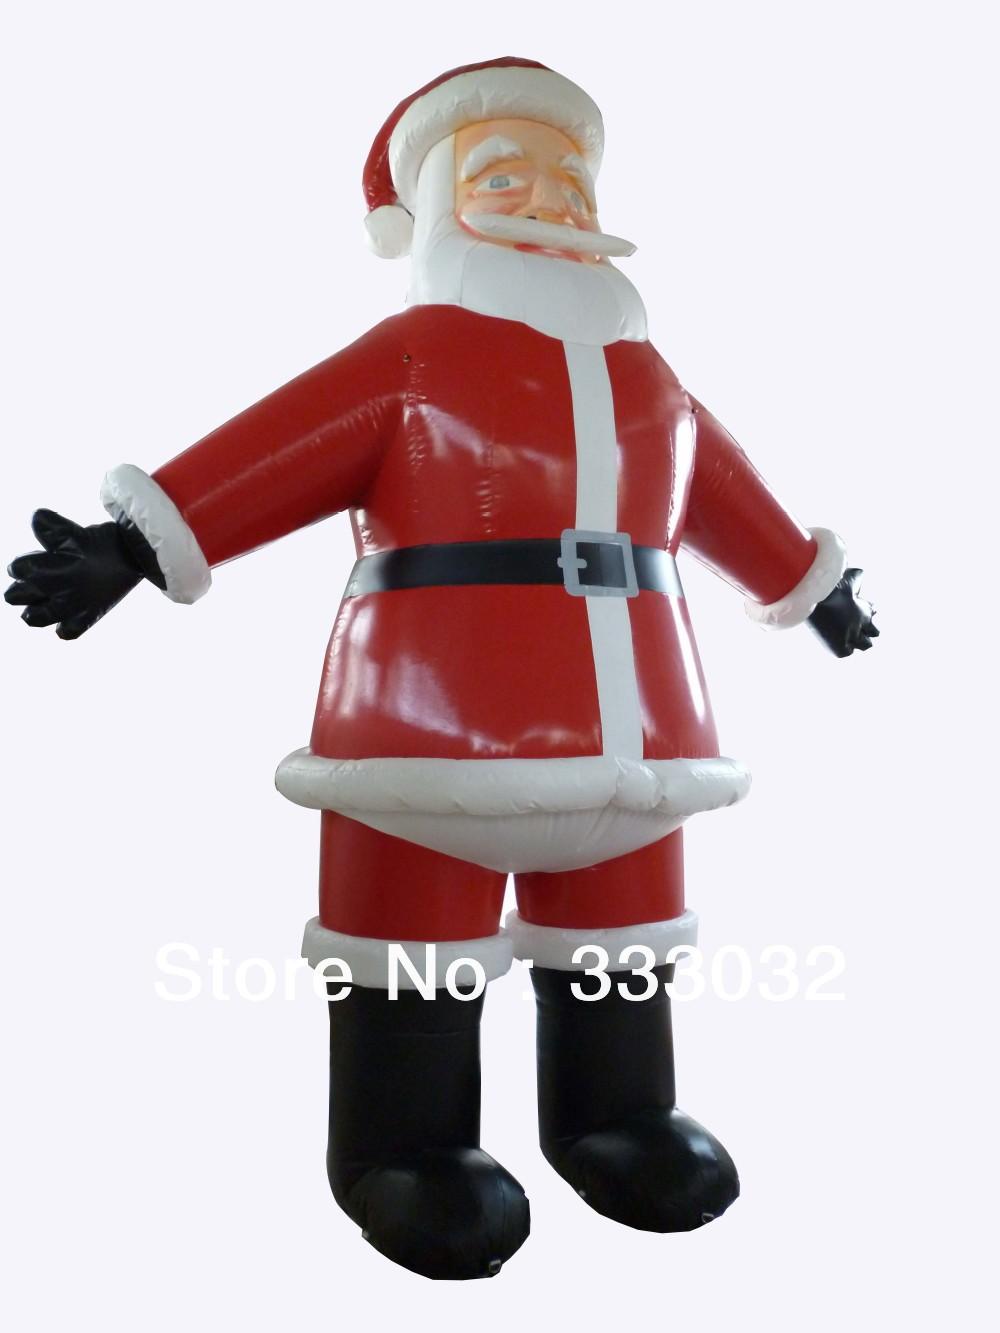 2013 New 6m inflatable Santa Claus Plato PVC tarpaulin durable inflatable huge Christmas nice idea for decoration(China (Mainland))